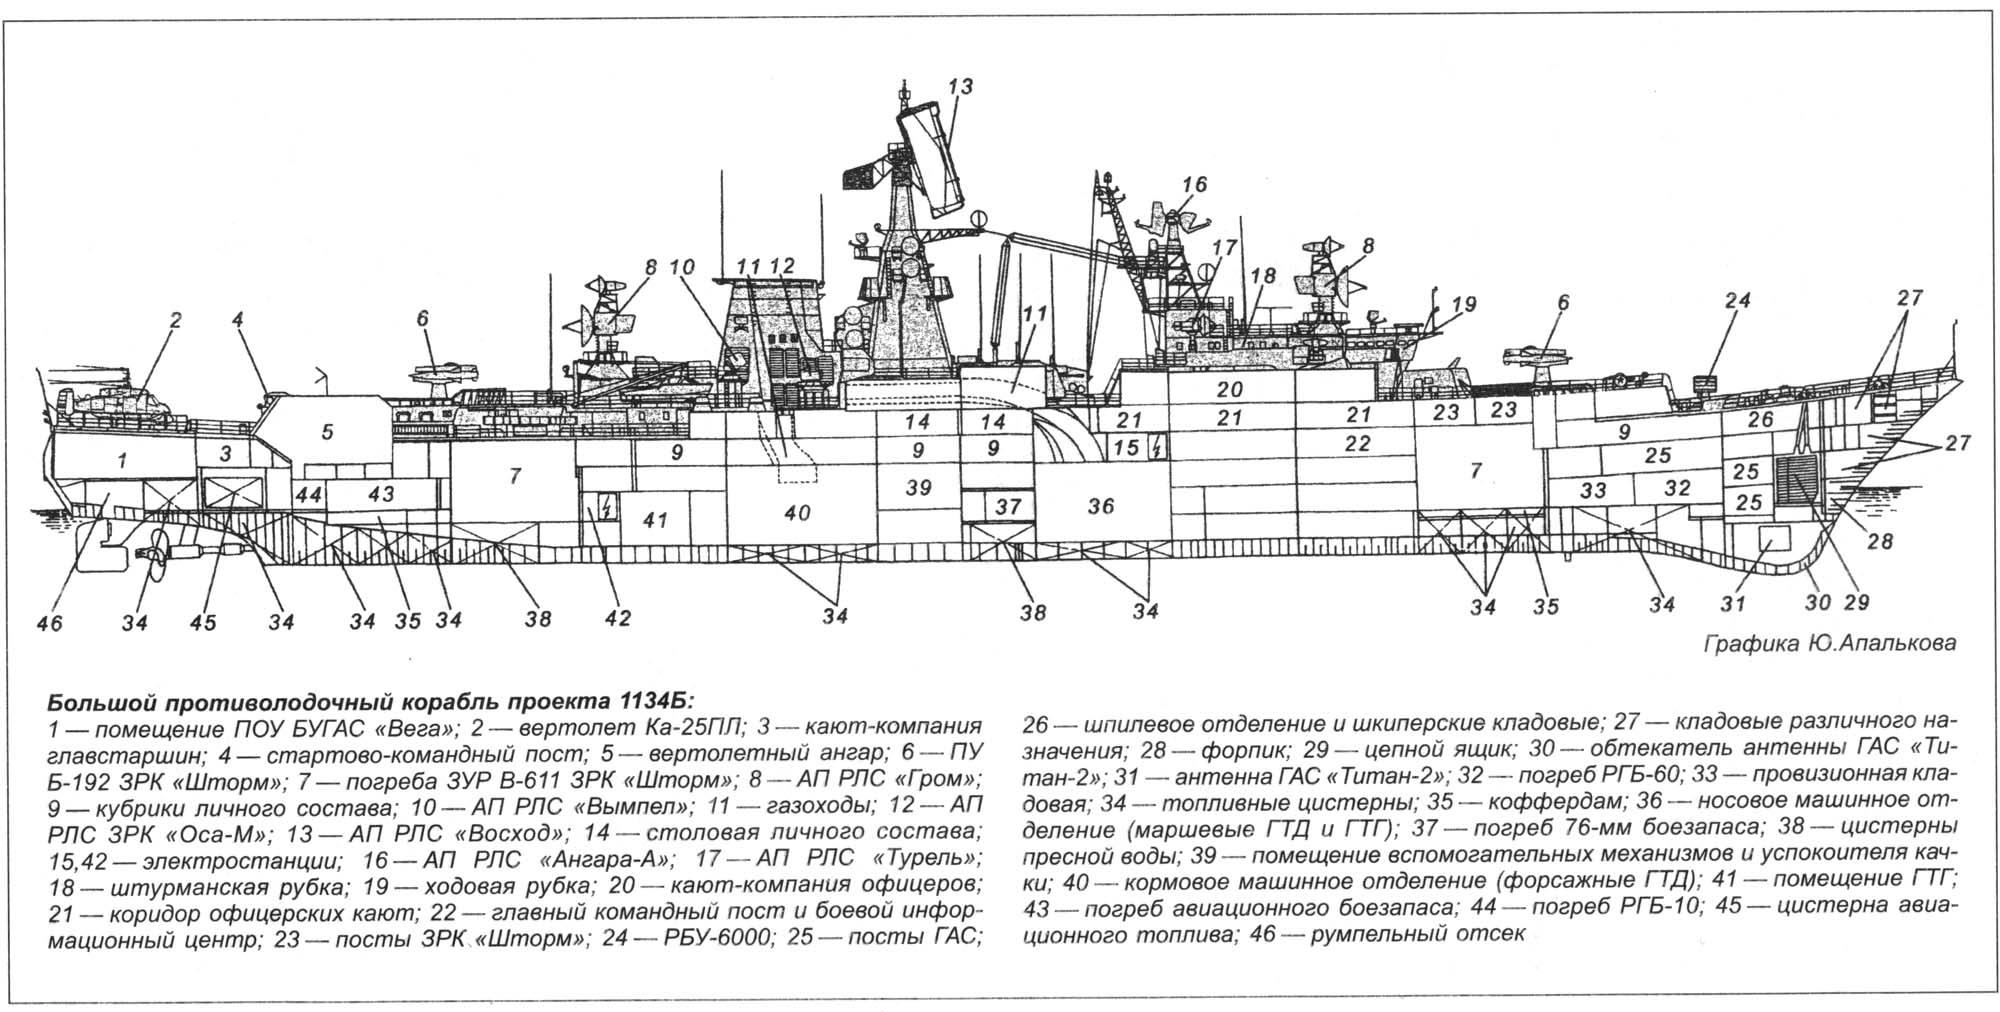 Устройство военного корабля схема